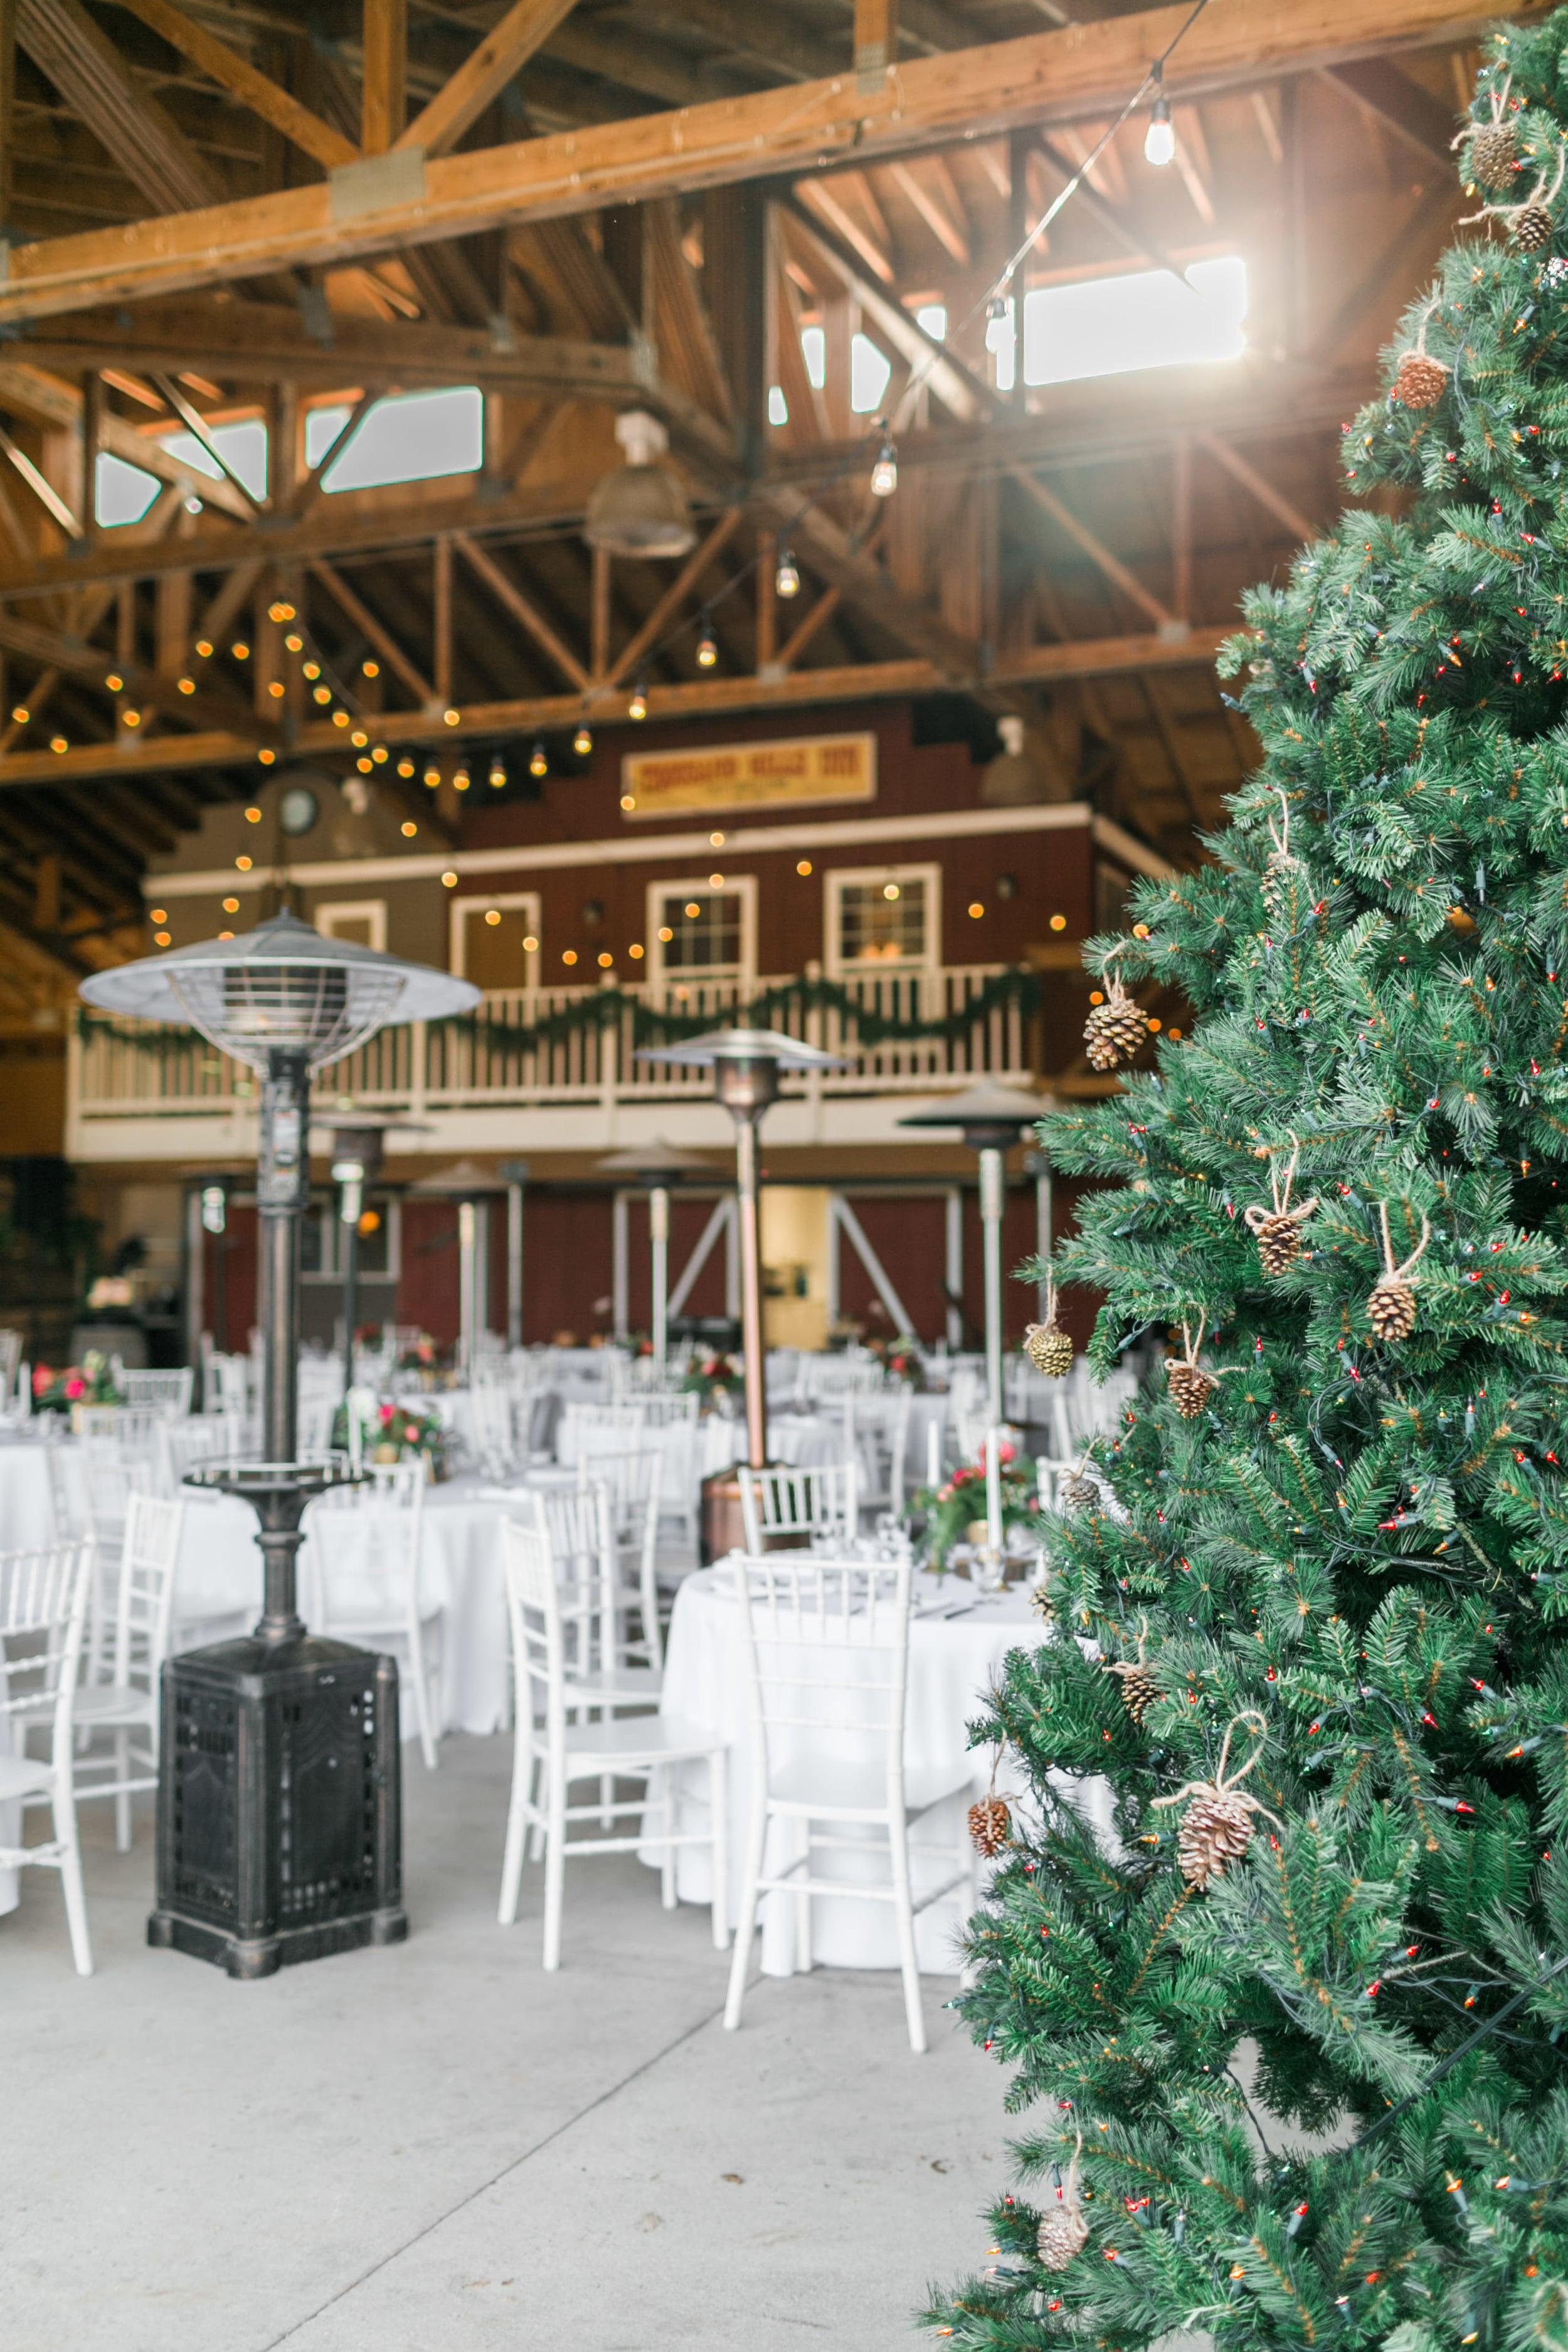 Natalie_Schutt_Photography_Winter_Wedding_San_Luis_Obispo-71.jpg